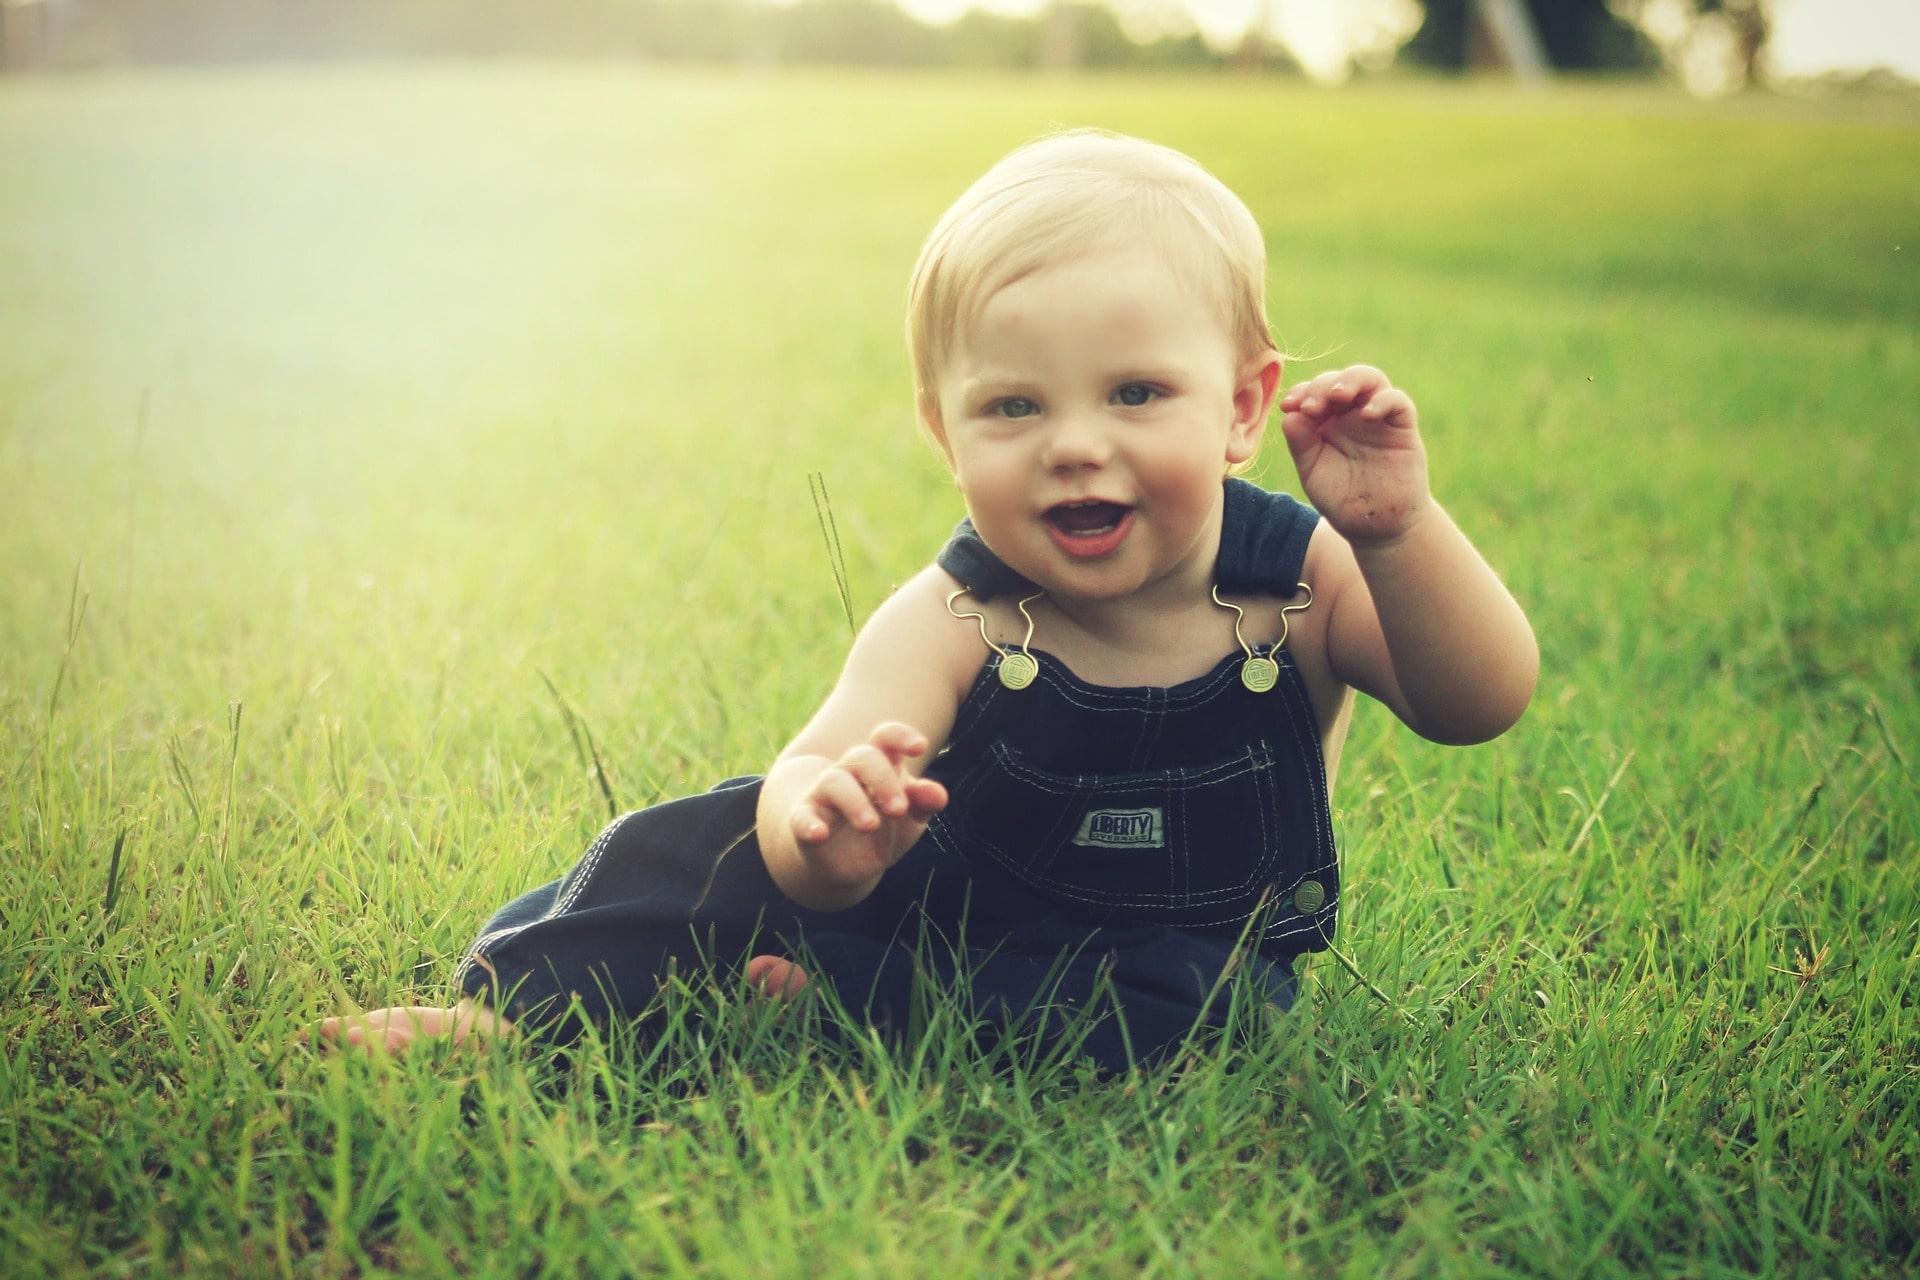 baby-390555_1920-min.jpg